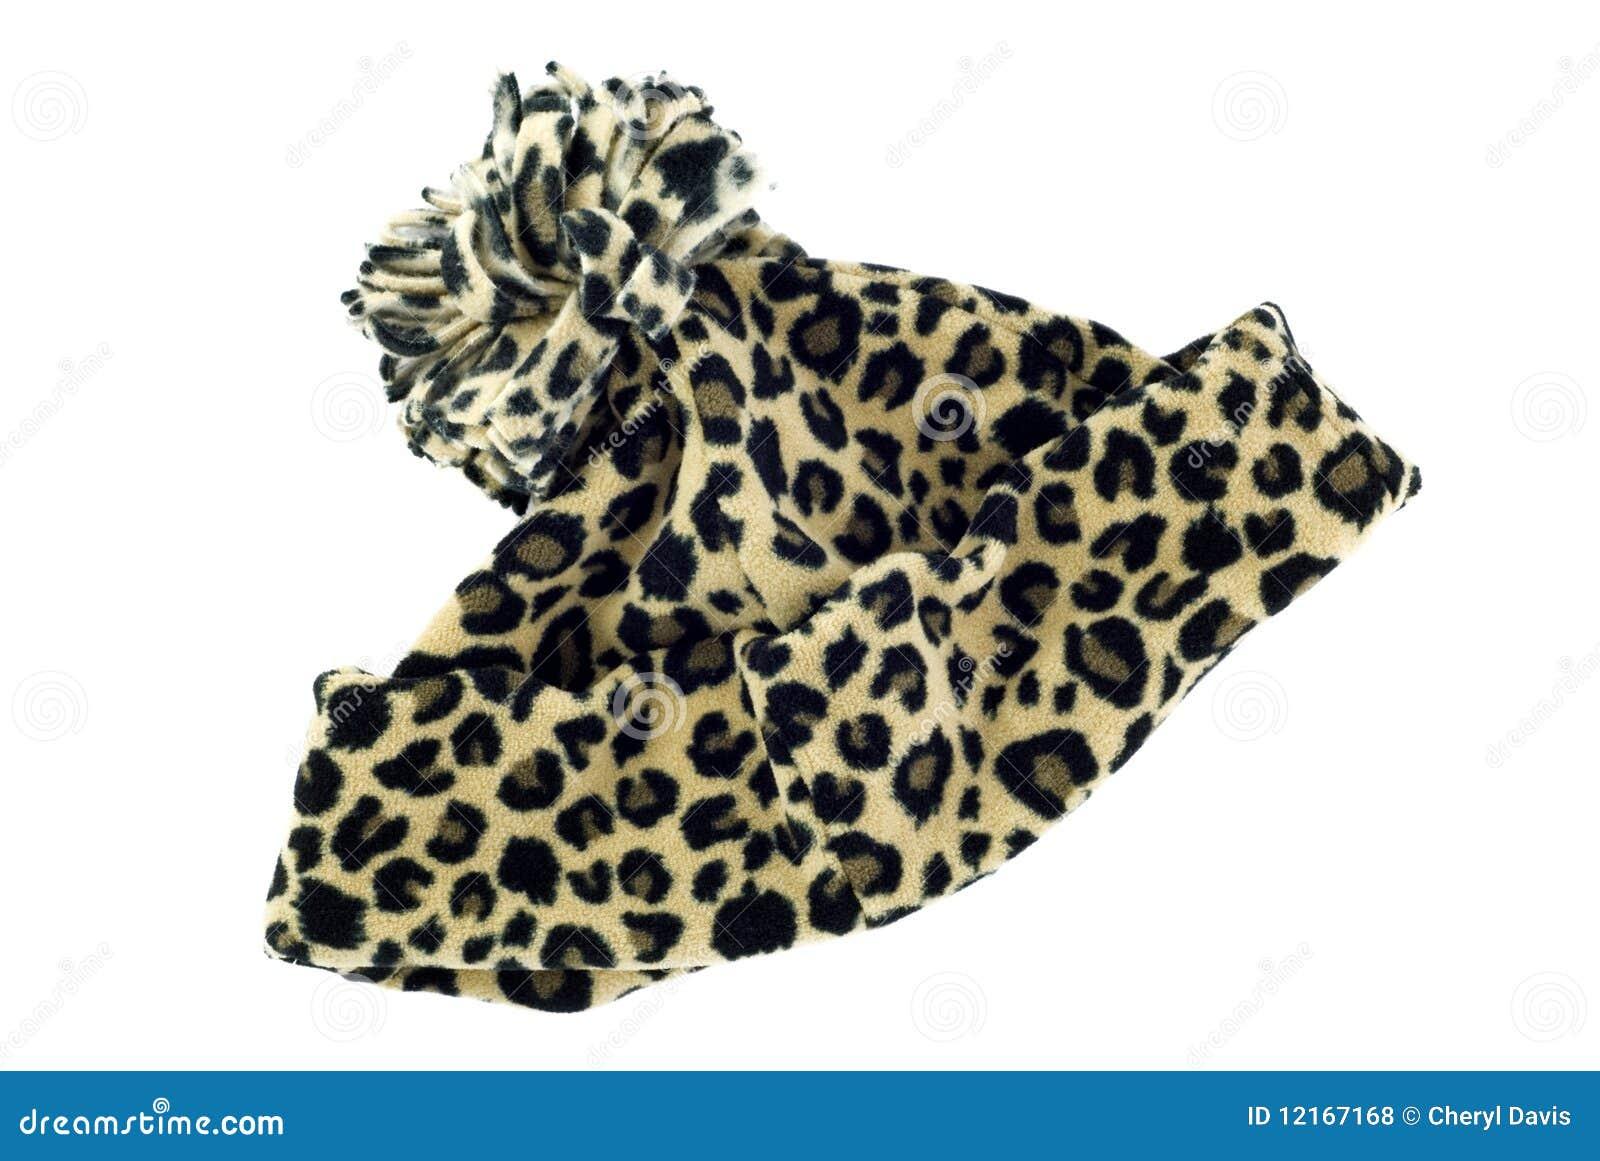 Leopard winter hat : Energy music